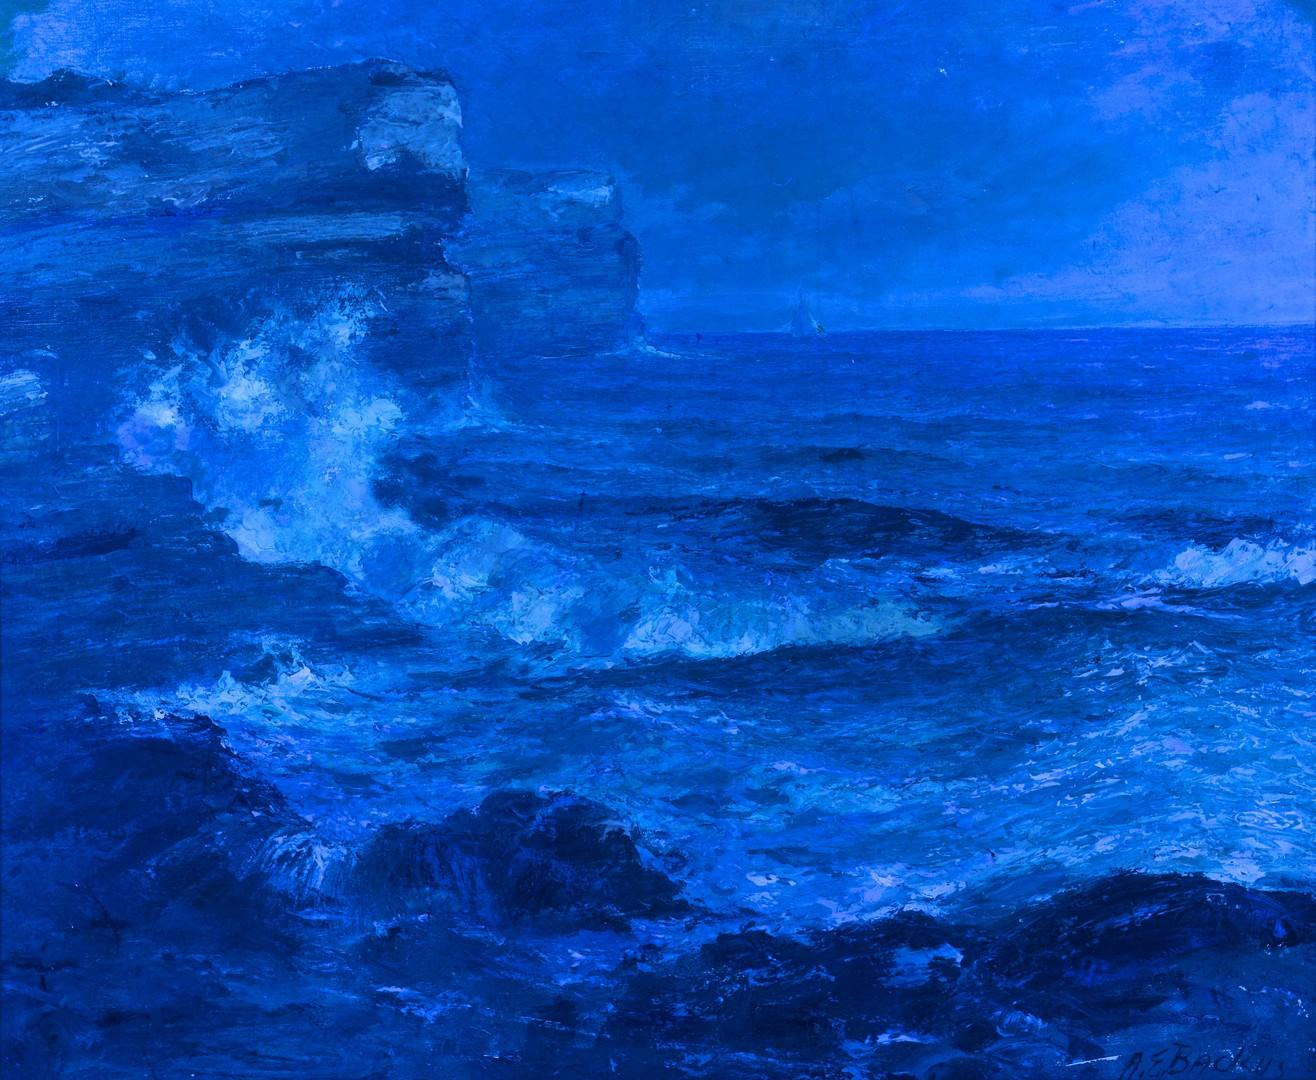 Lot 120: A.E. Backus oil on canvas seascape, 25 x 30